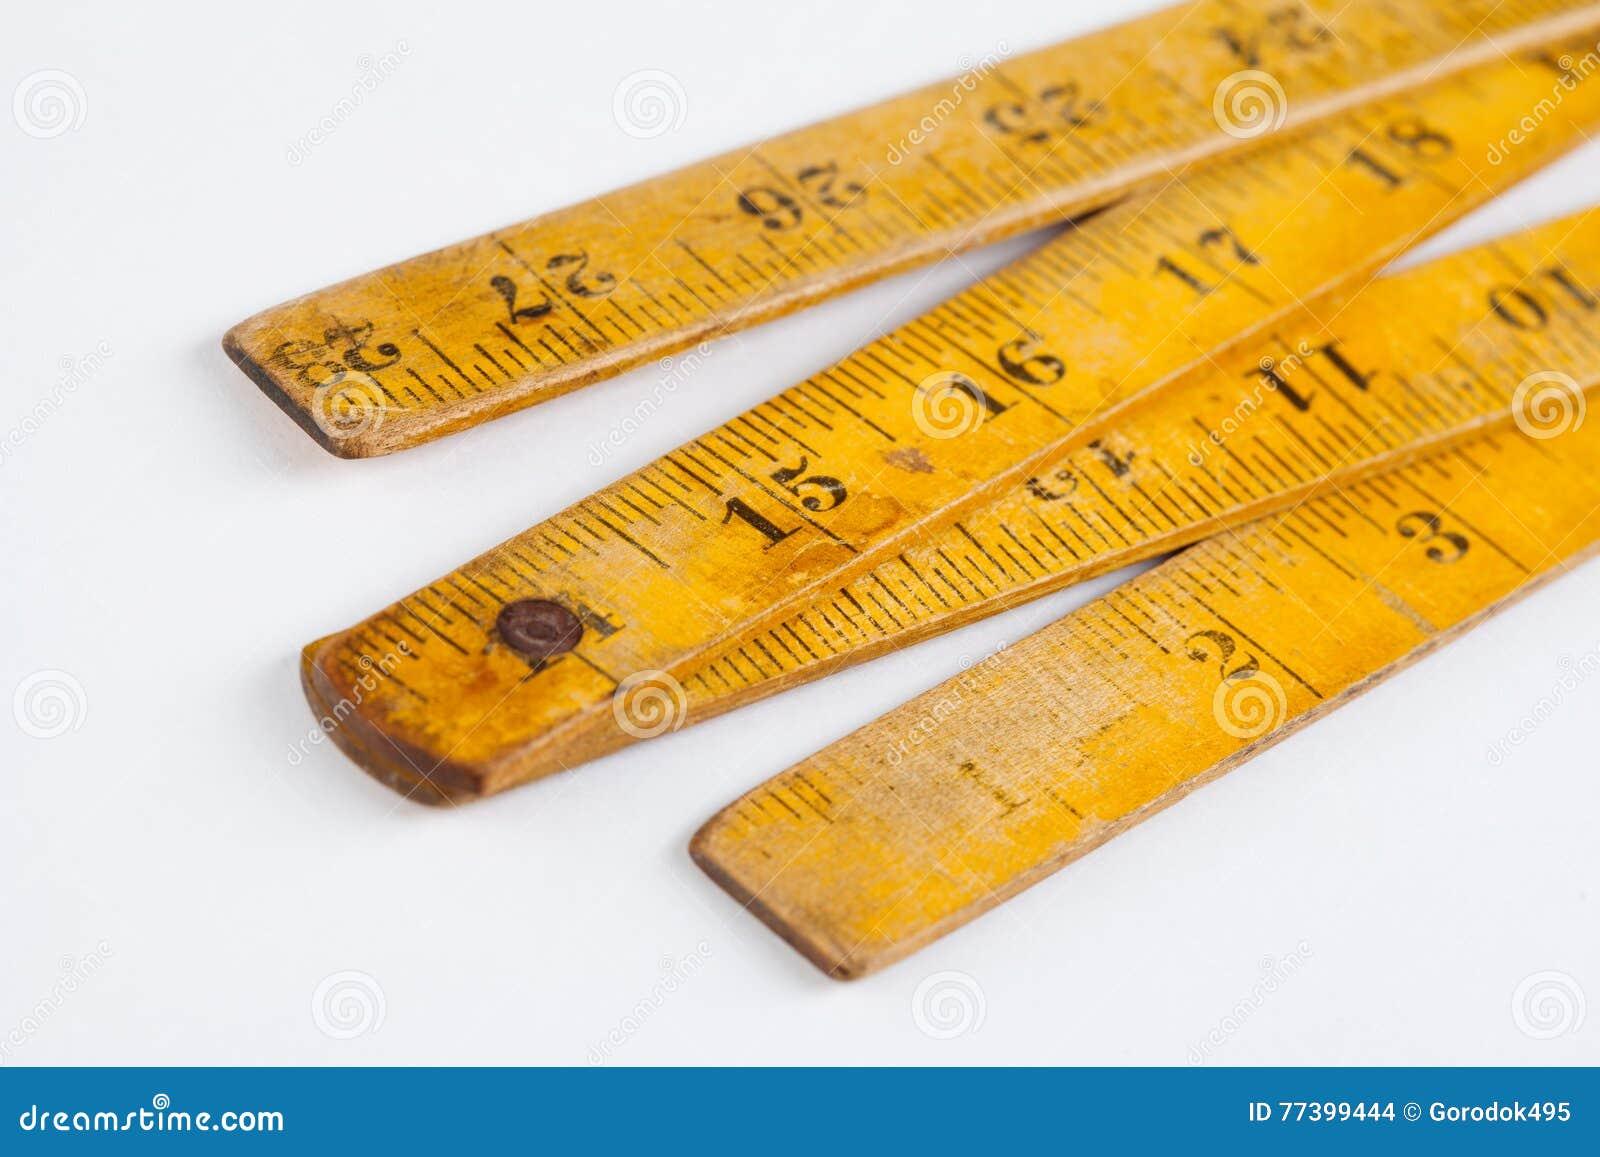 Time Measuring Instruments : Retro wooden carpenter ruler measure measuring tools